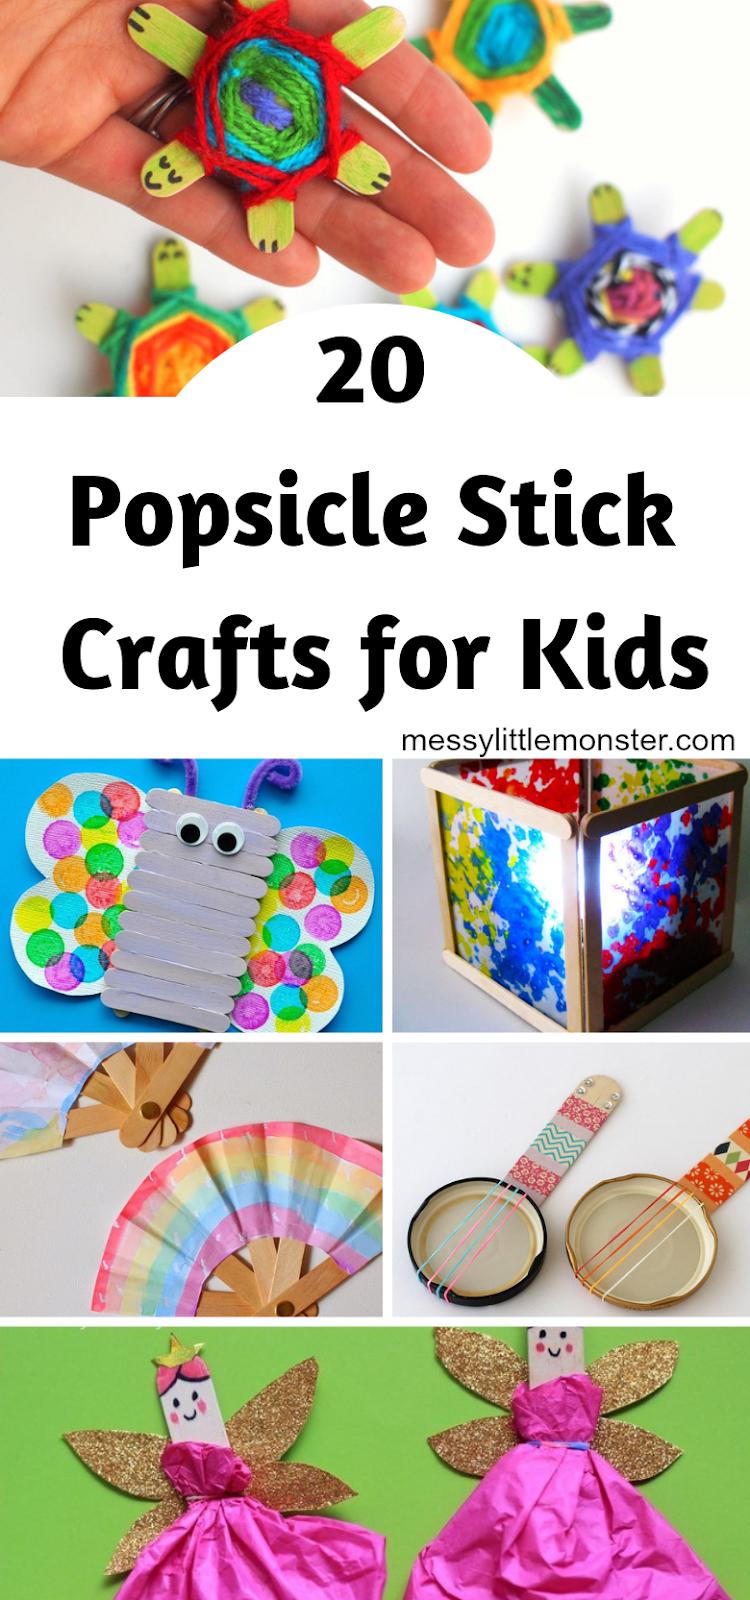 20+ popsicle stick crafts for kids